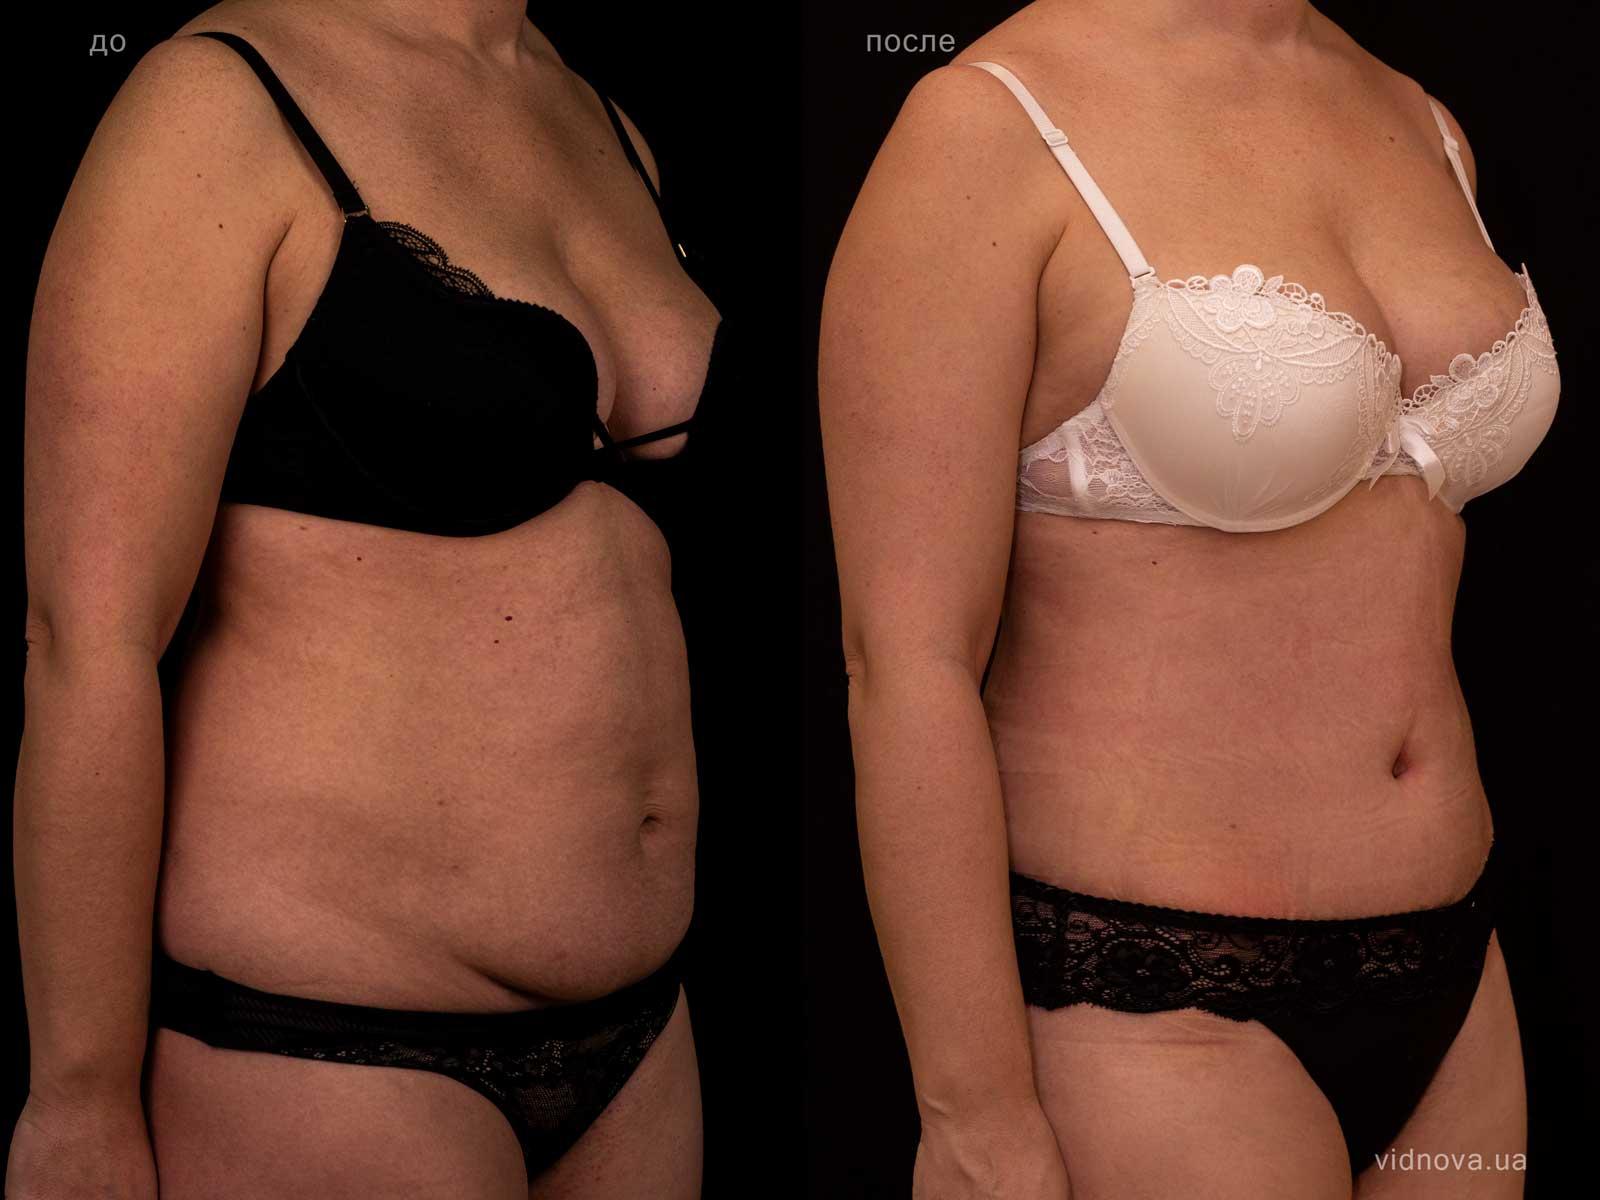 Пластика живота: результаты до и после - Пример №22-1 - Светлана Работенко